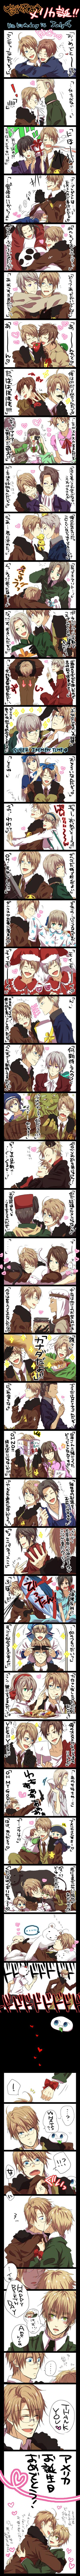 Tags: Anime, Oh Sawa, Axis Powers: Hetalia, Spain, Fran (FFXII), Iceland, Hungary, Germany, Finland, Japan, Russia, Austria, Norway